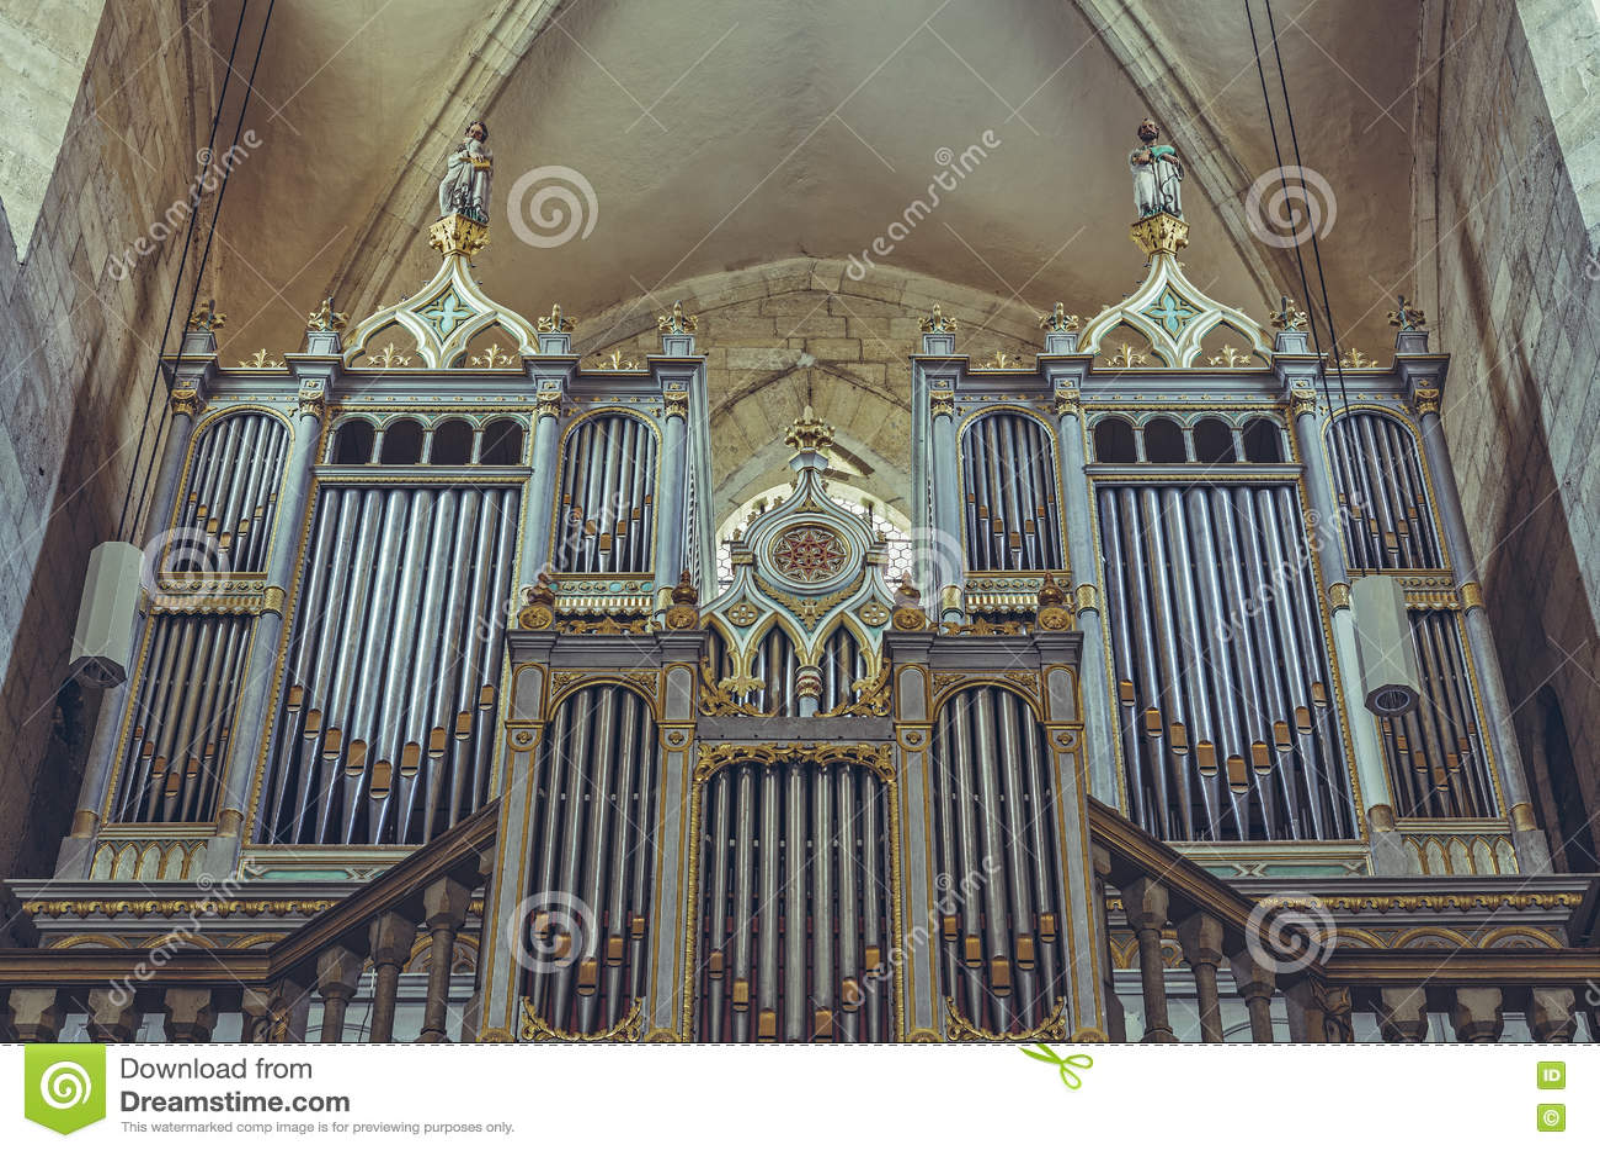 Neogothic organ in Saint Michael Cathedral, Alba Iulia, Romania